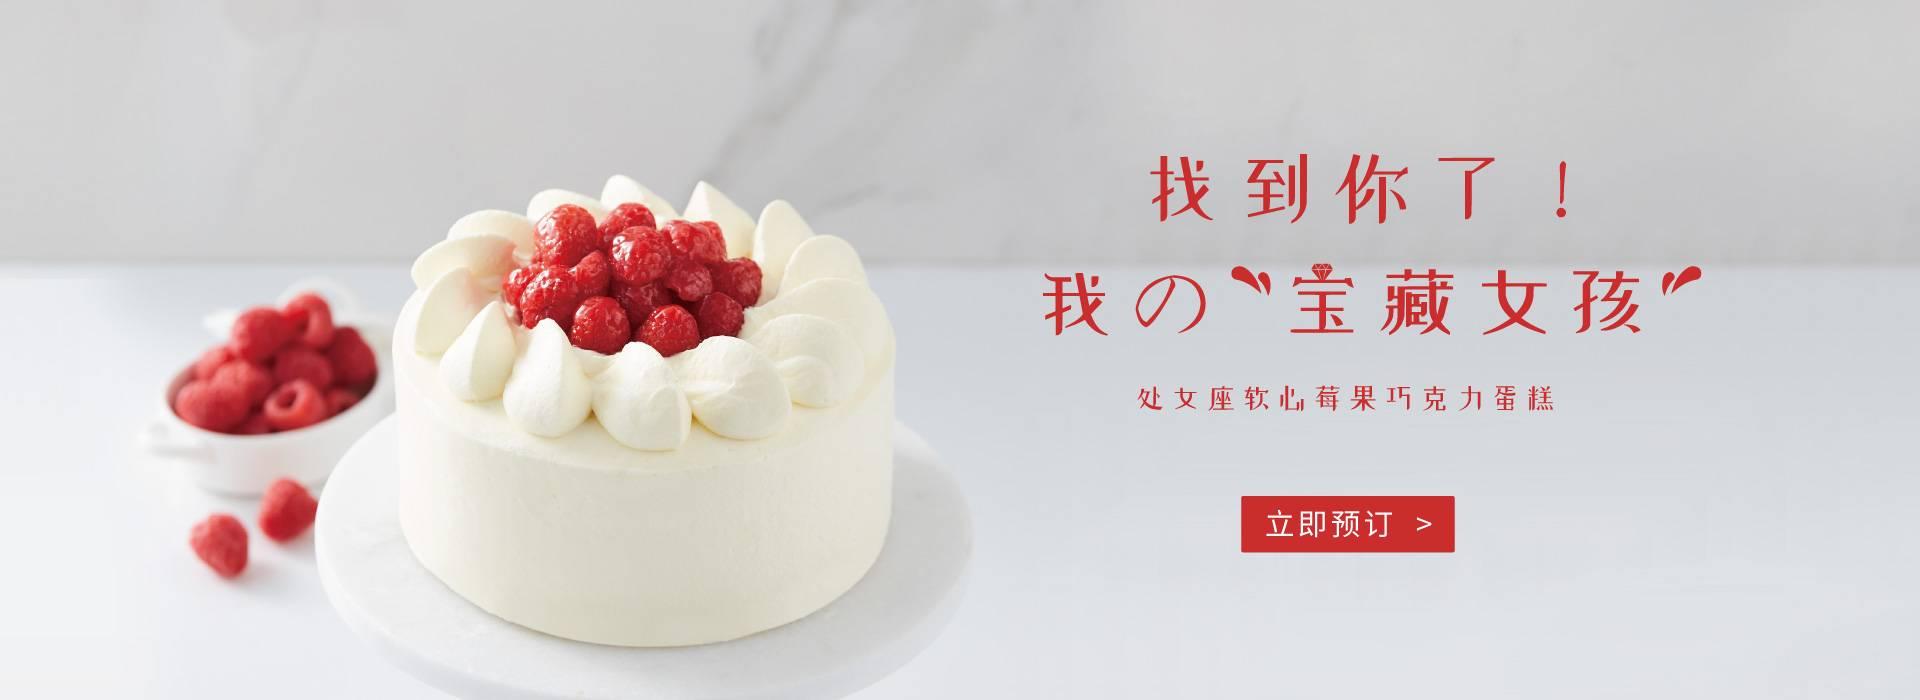 Virgo mixed berry chocolate cake